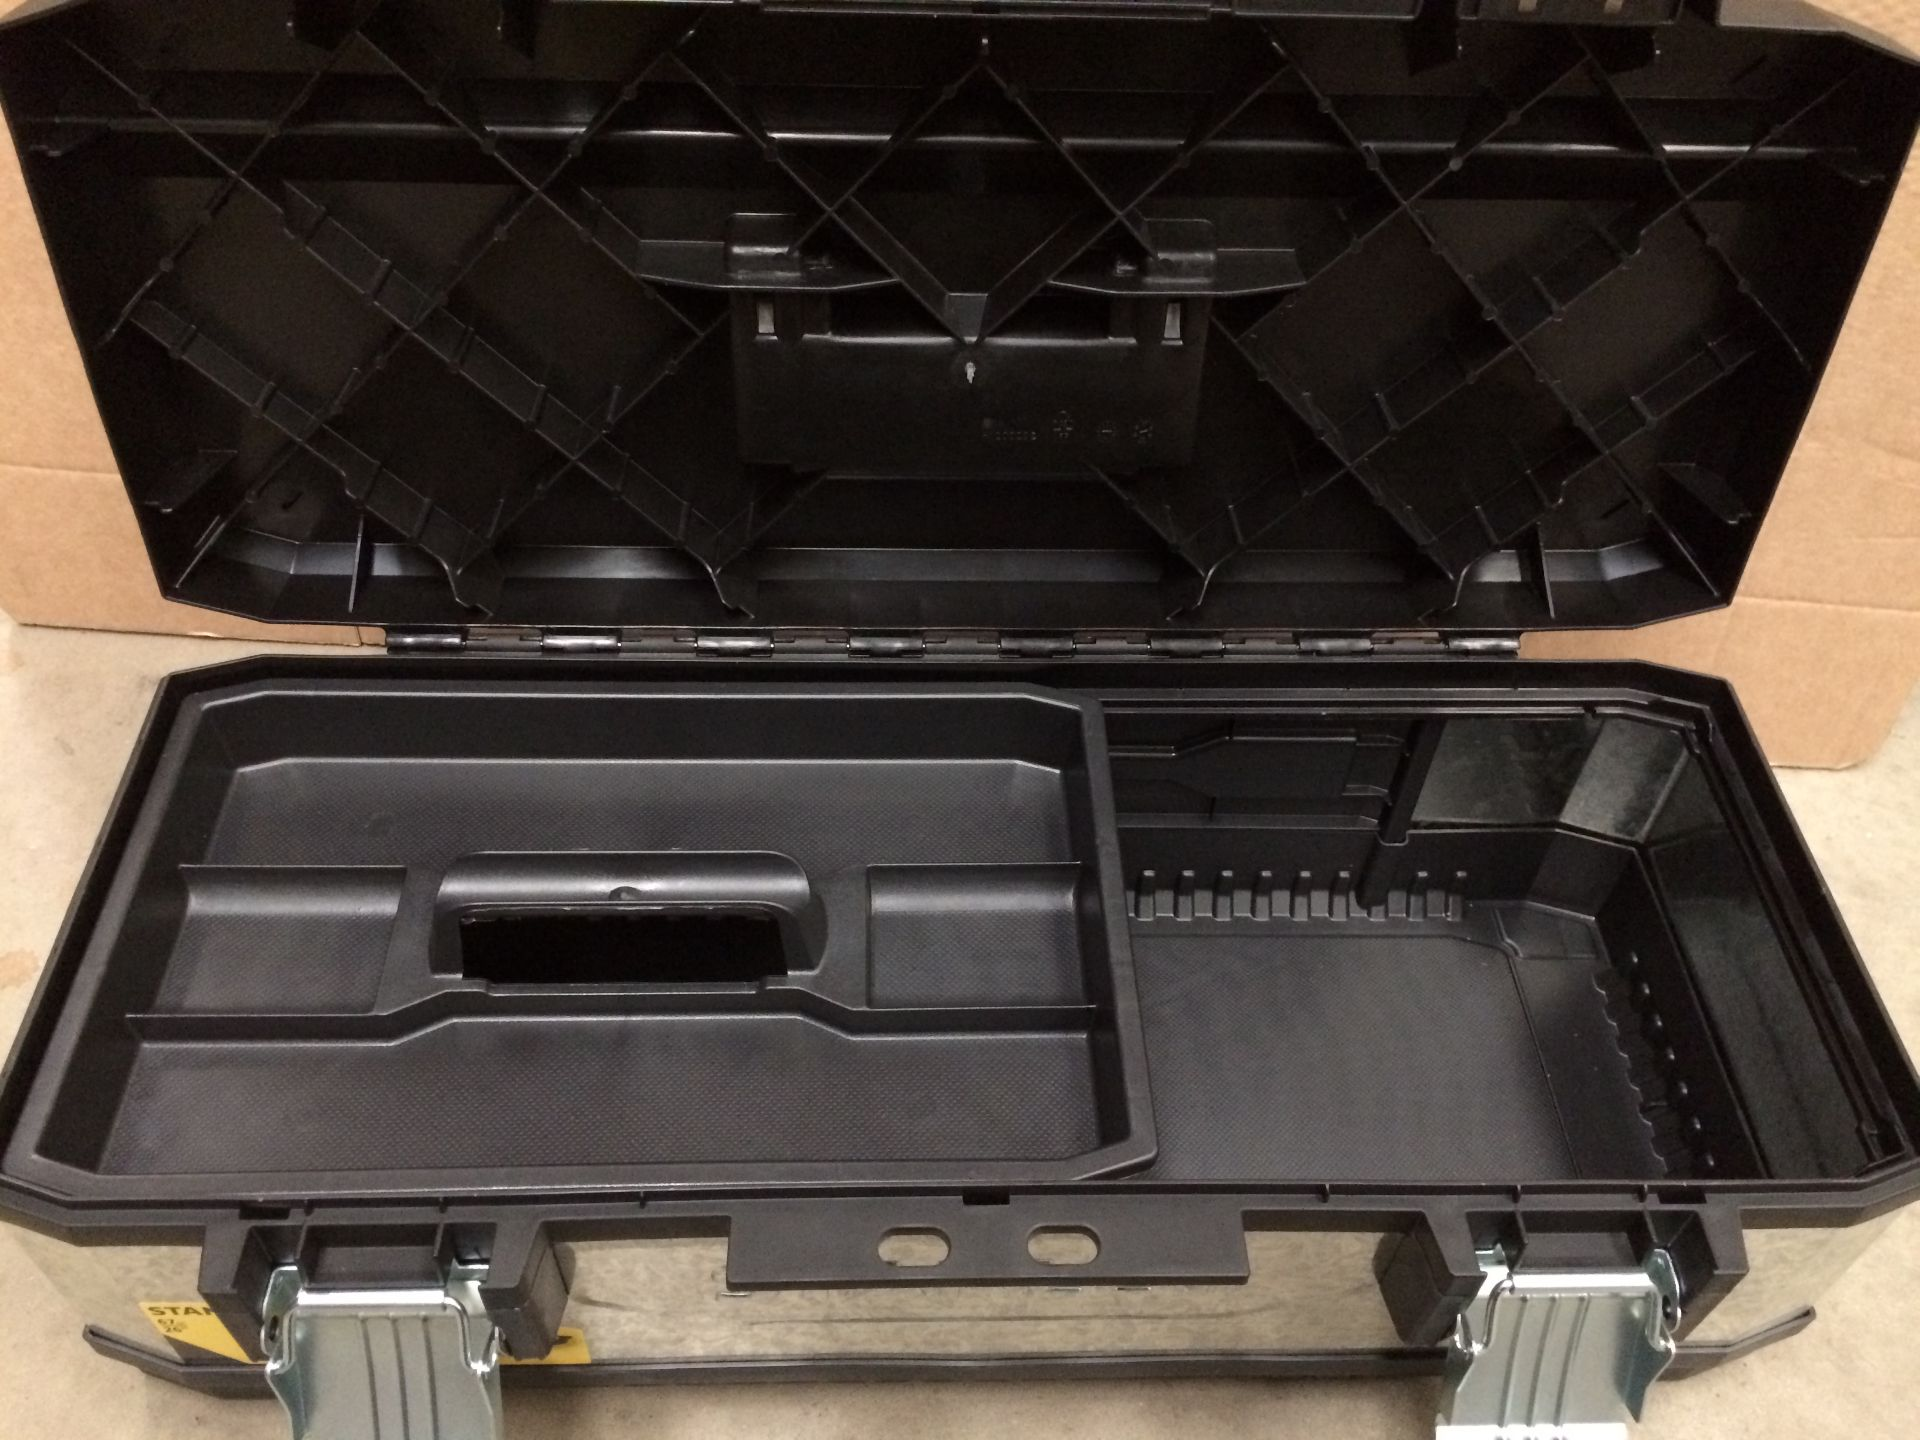 Stanley 67cm metal tool box - Image 2 of 2